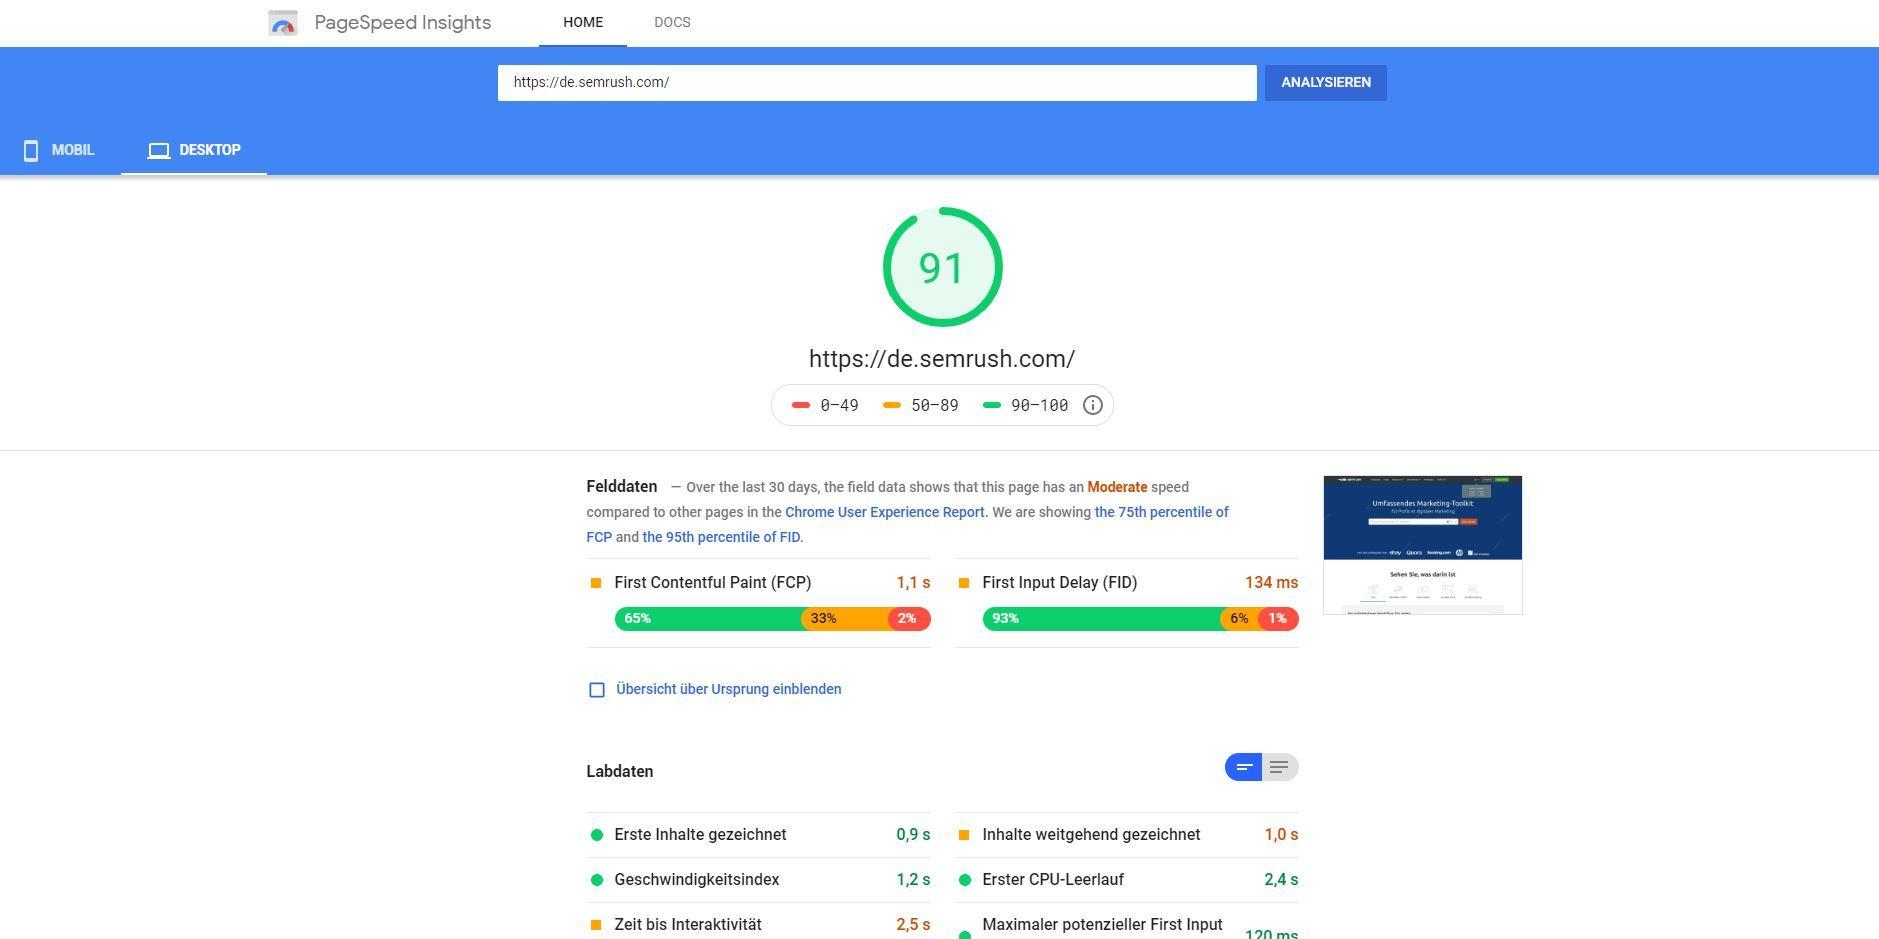 PageSpeed Insights: Desktop